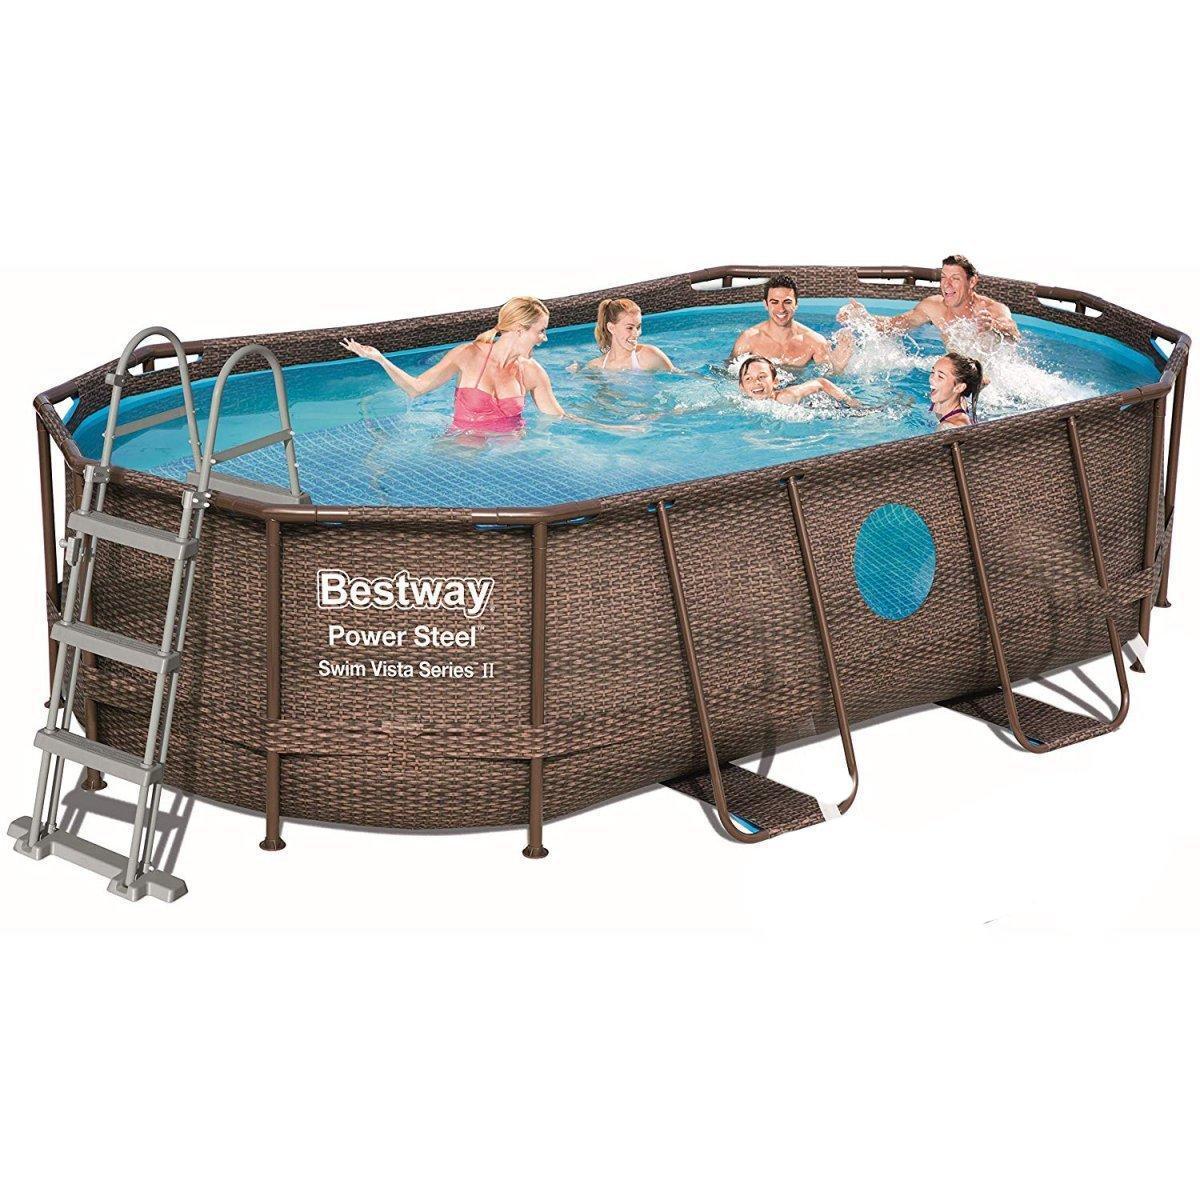 Каркасный бассейн Bestway 56714 - 1, 427 х 250 х 100 см (лестница, тент, подстилка)